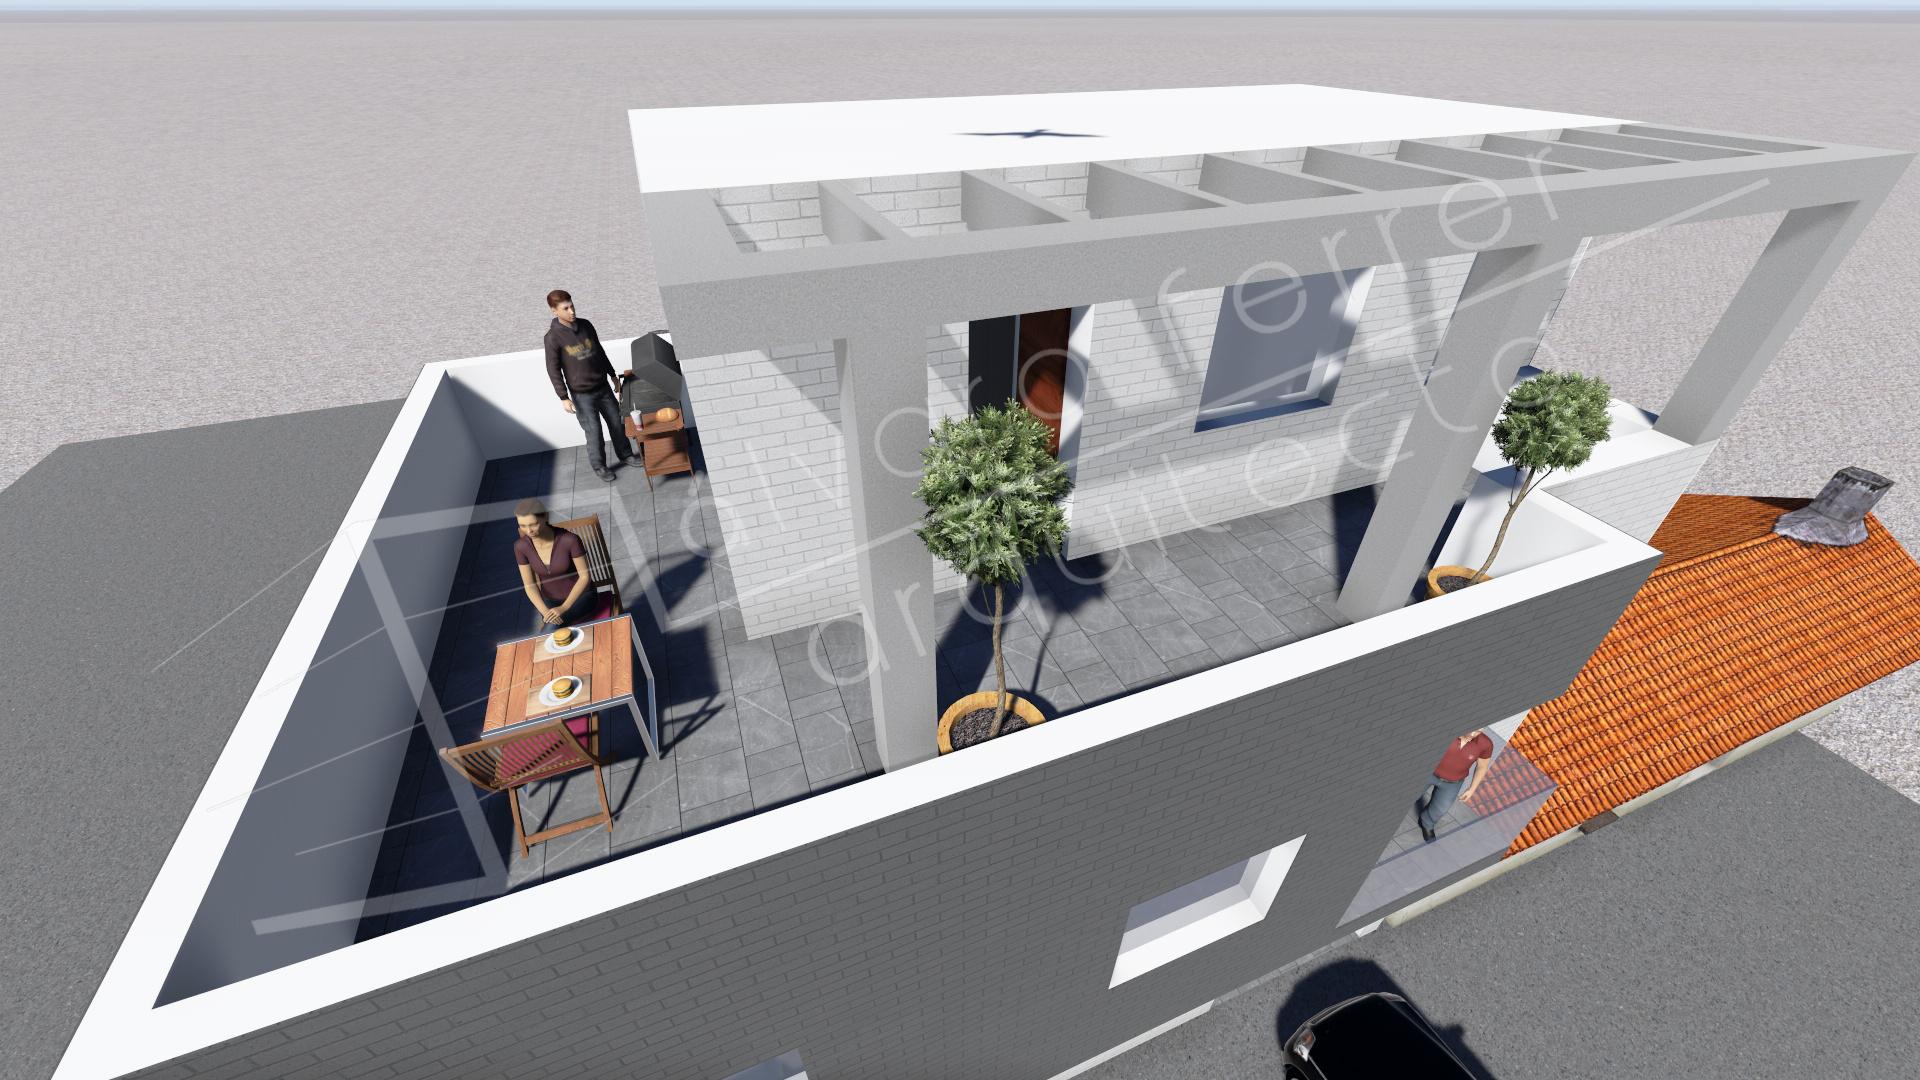 vivienda_unifamiliar_alvaro_ferrer_arquitecto_3